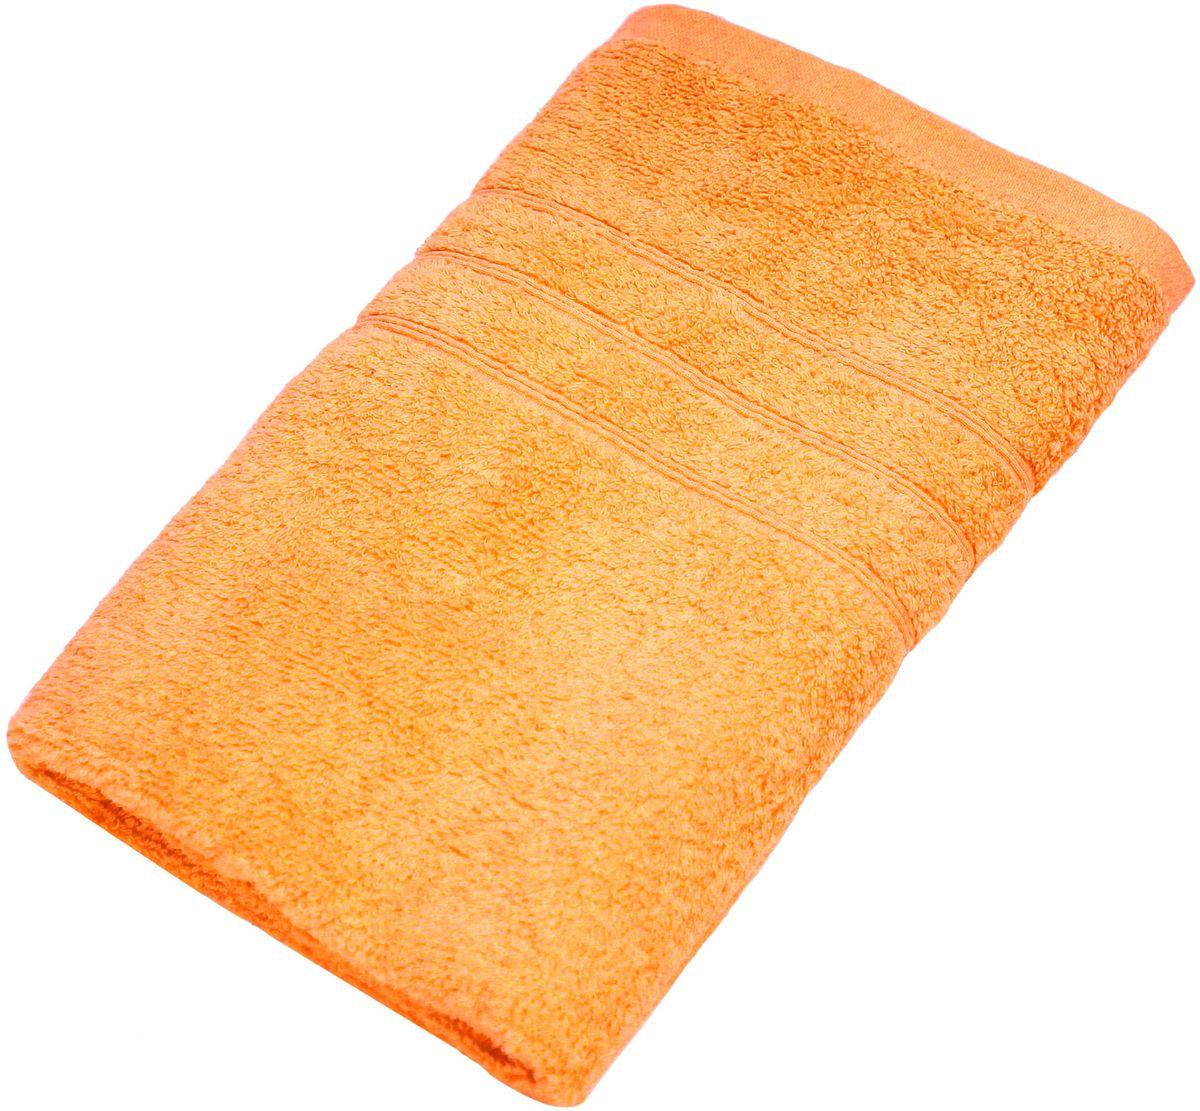 Полотенце Proffi Home Модерн, цвет: оранжевый, 50x100 смPH3271Состав: 100% хлопок.